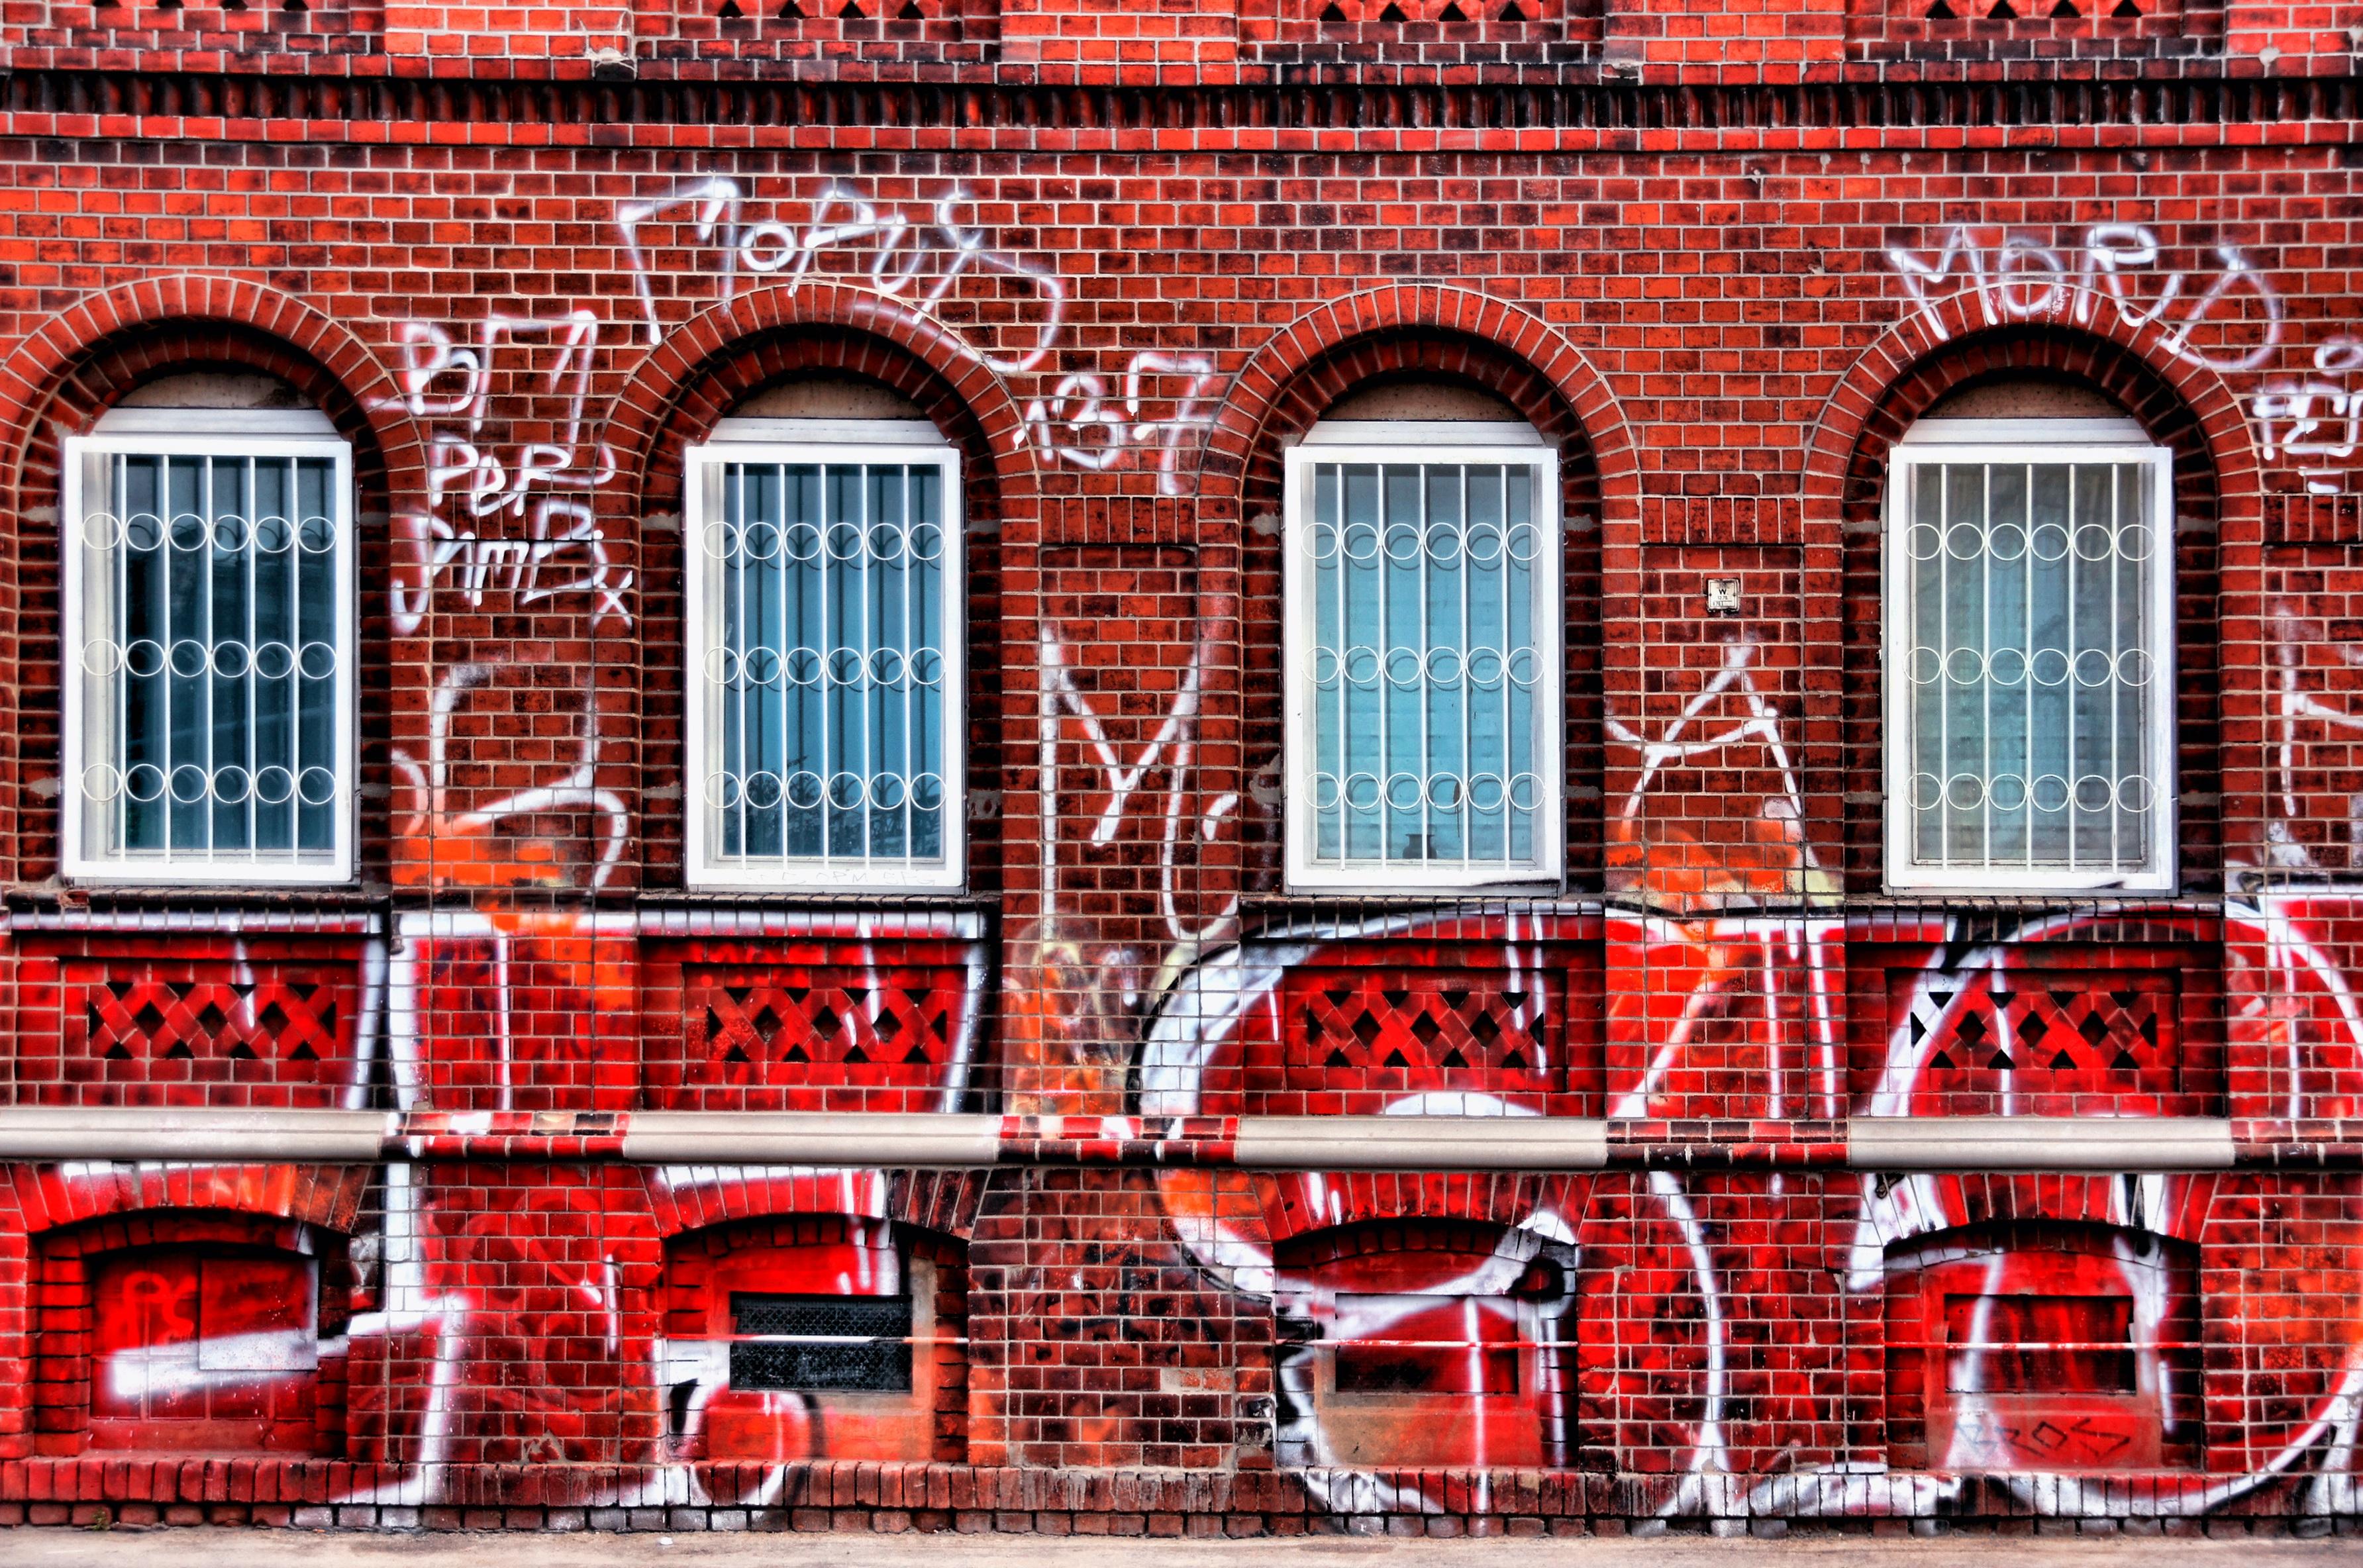 Grafiti wall red - Architecture Window Wall Suburb Red Spray Facade Factory Brick Graffiti Painting Art Design Leipzig Brickwork Wall